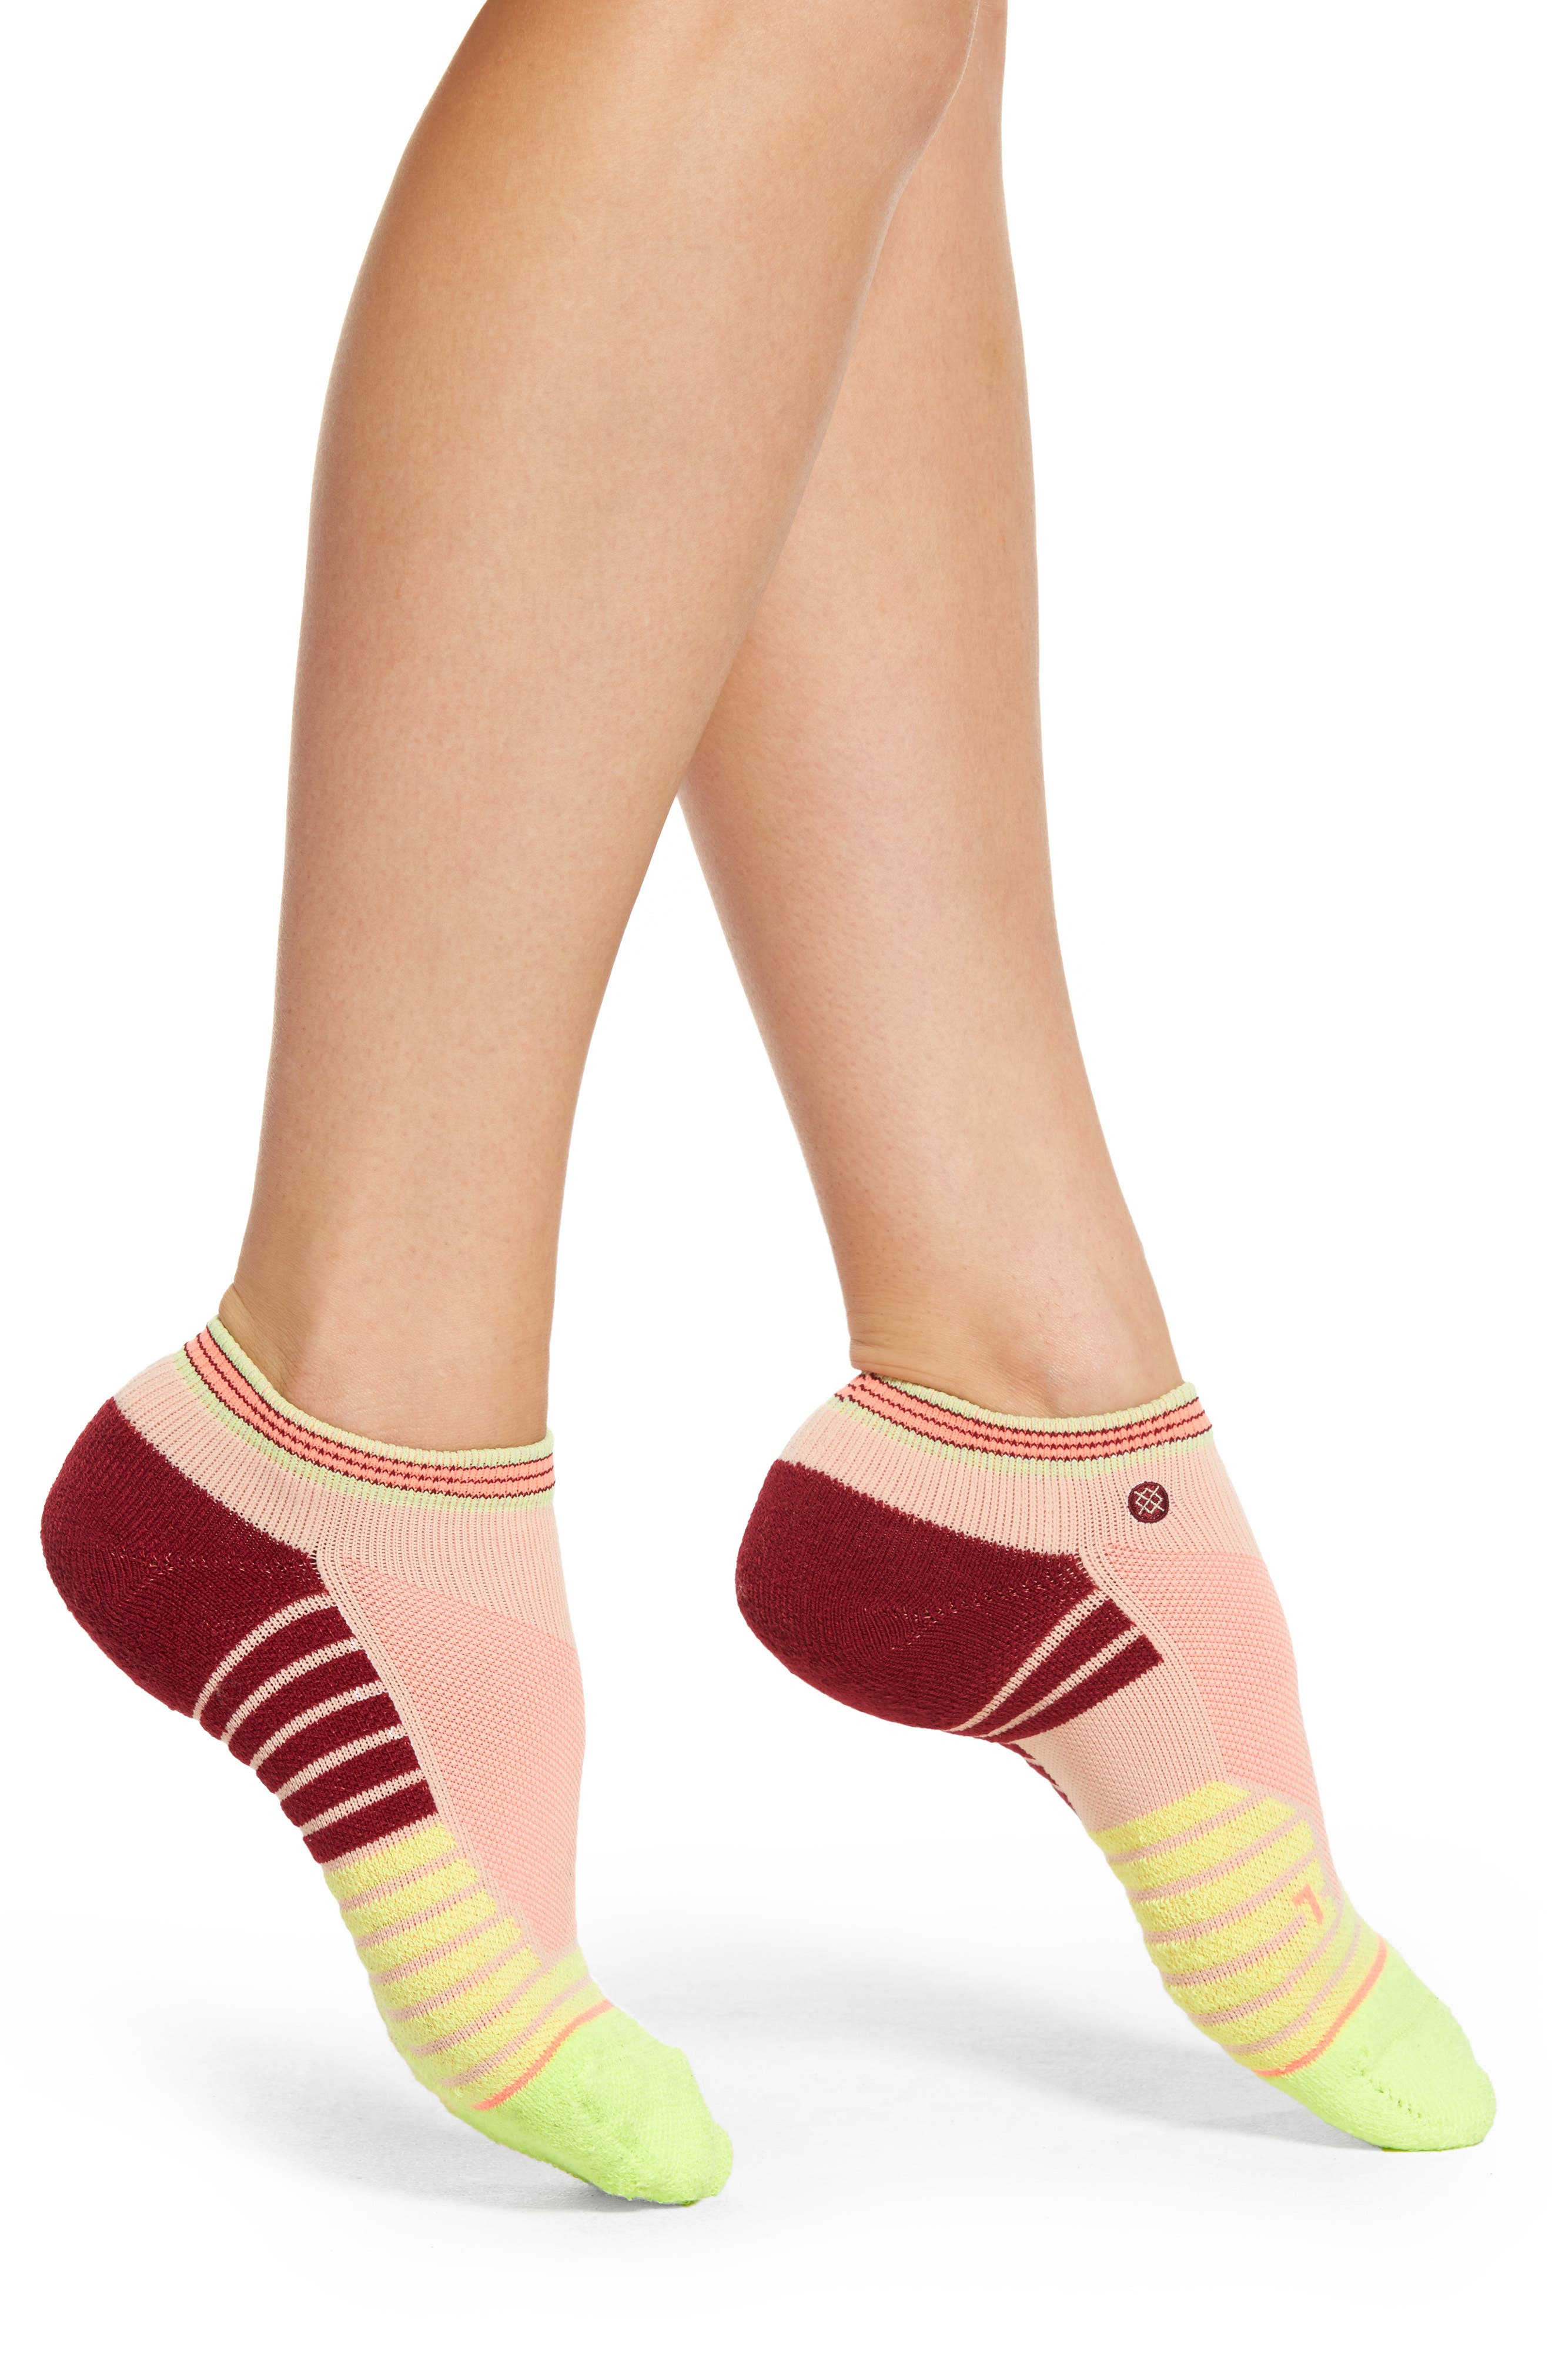 Stance Record Low Training Socks